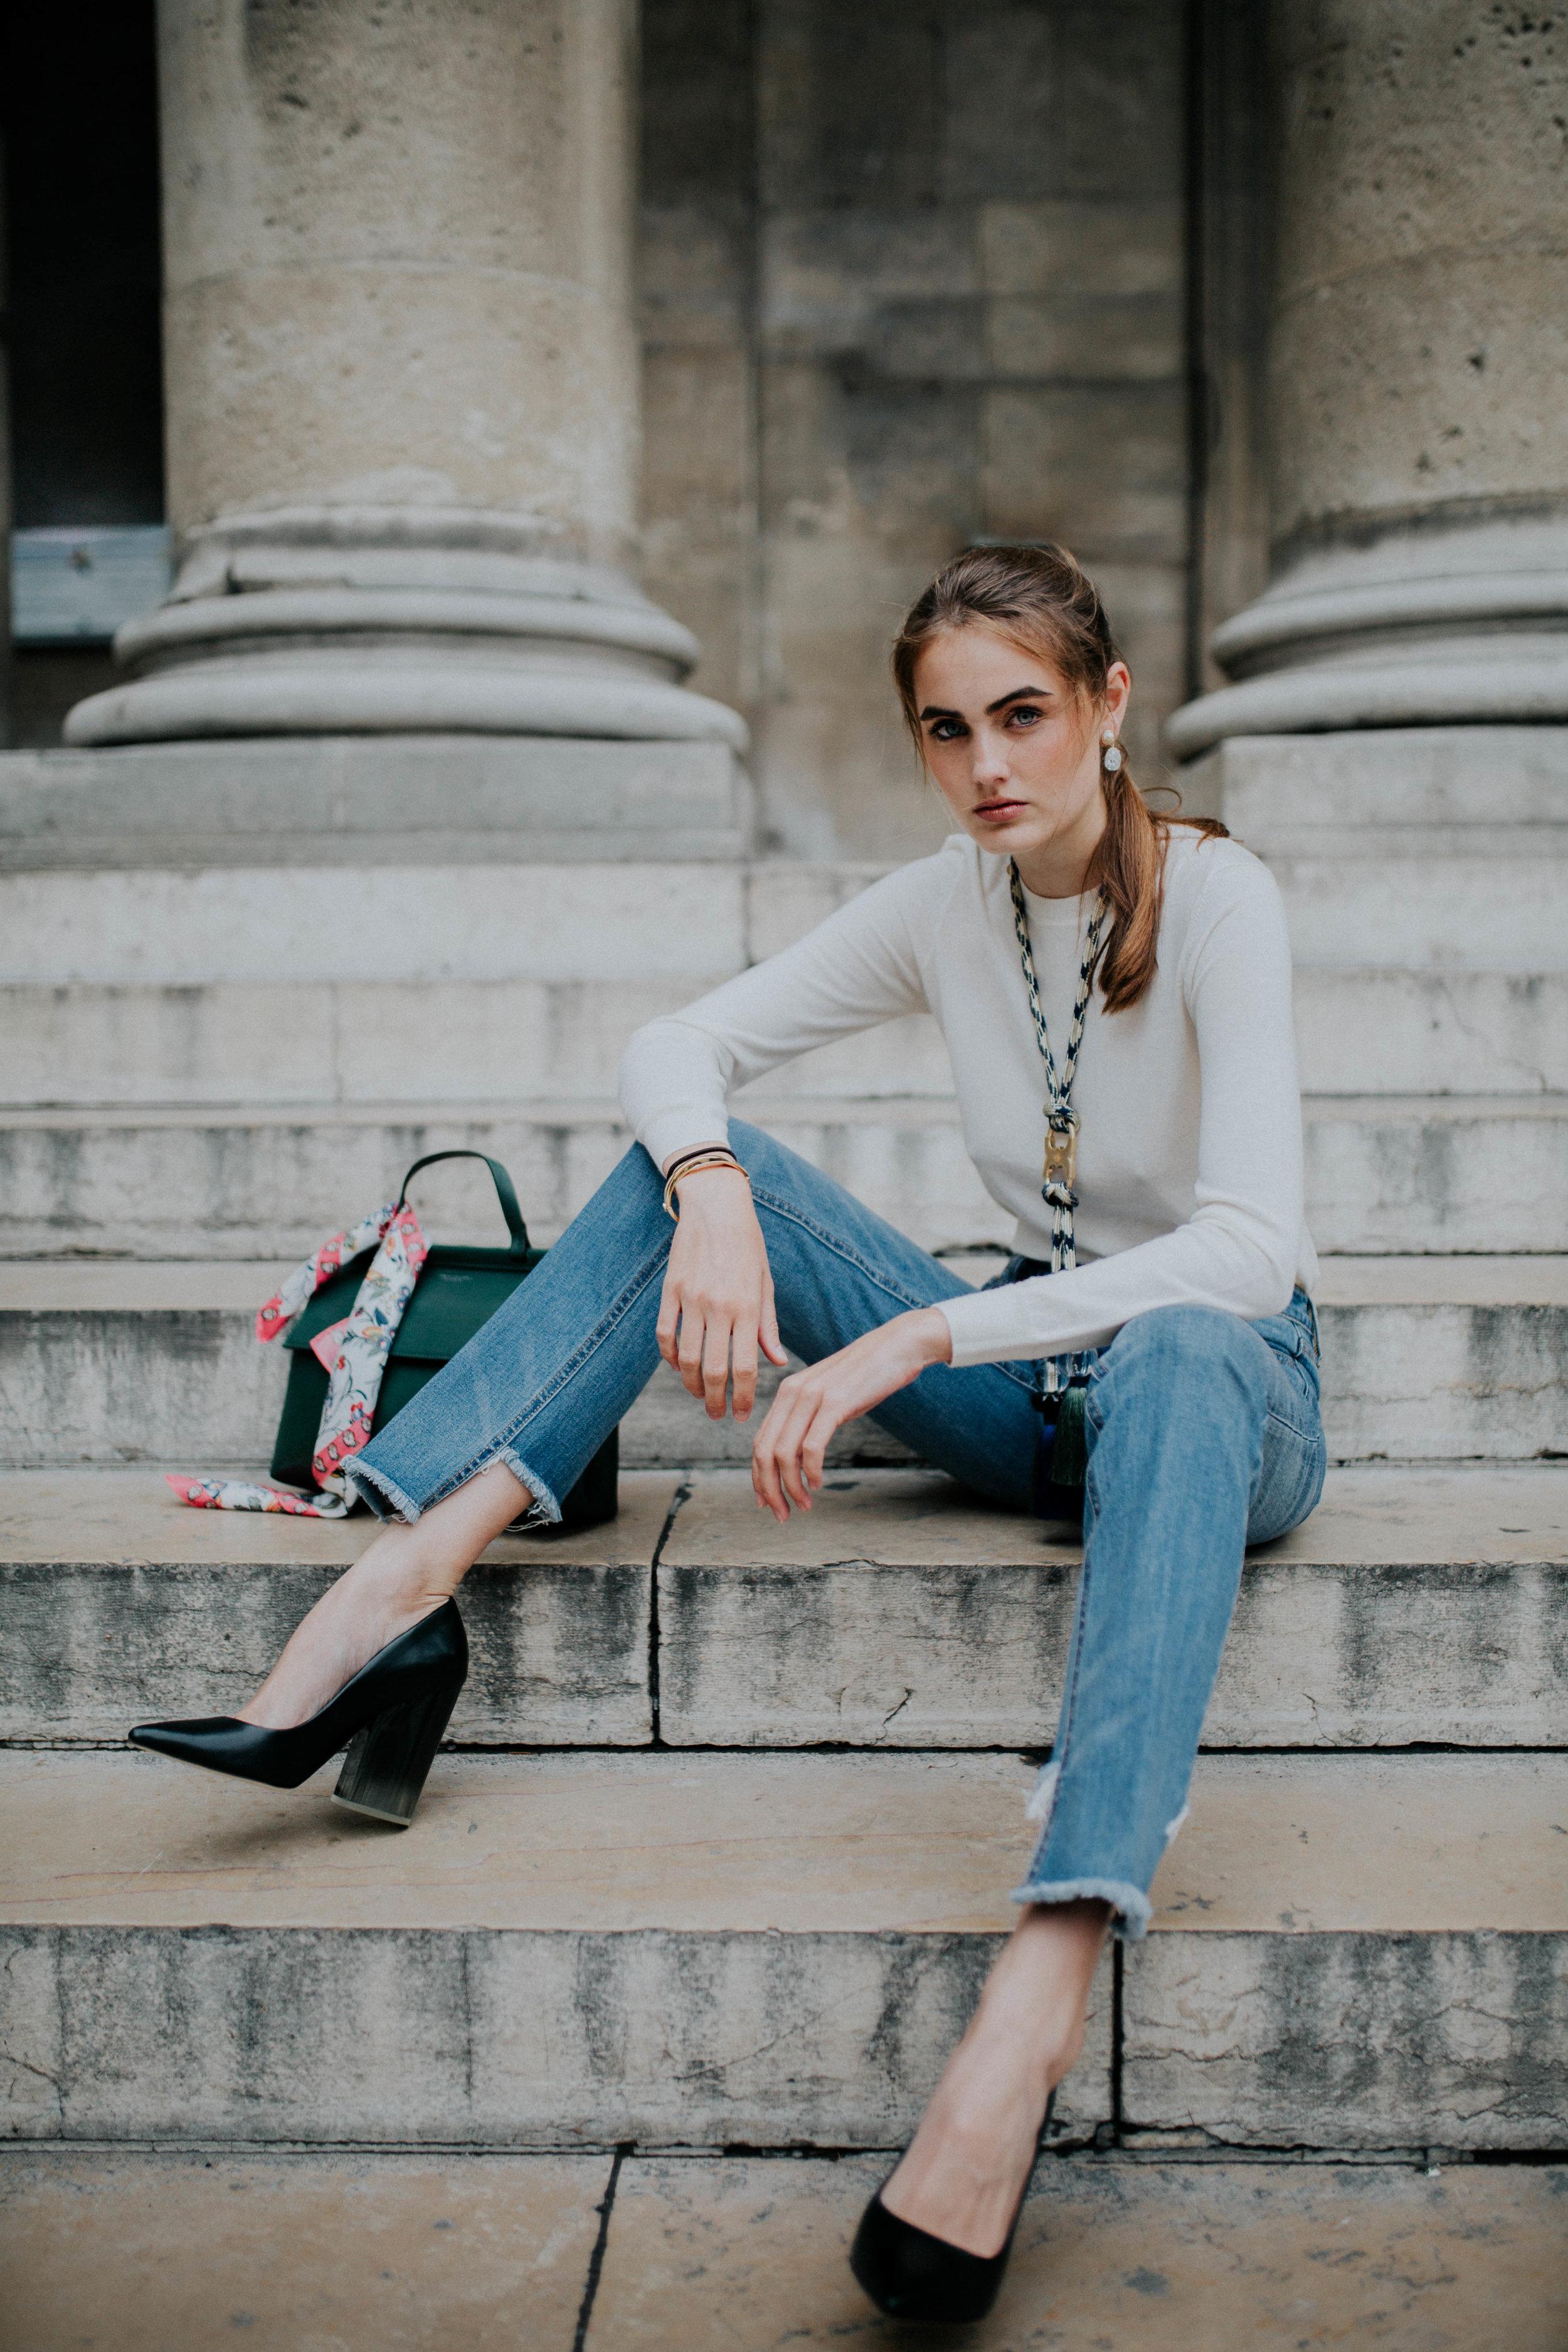 Lisa Abos - Lisa's Look #4: Iberia Cashmere Sweater,Long Gemini-Link Rope Necklace , Francesca Pumps